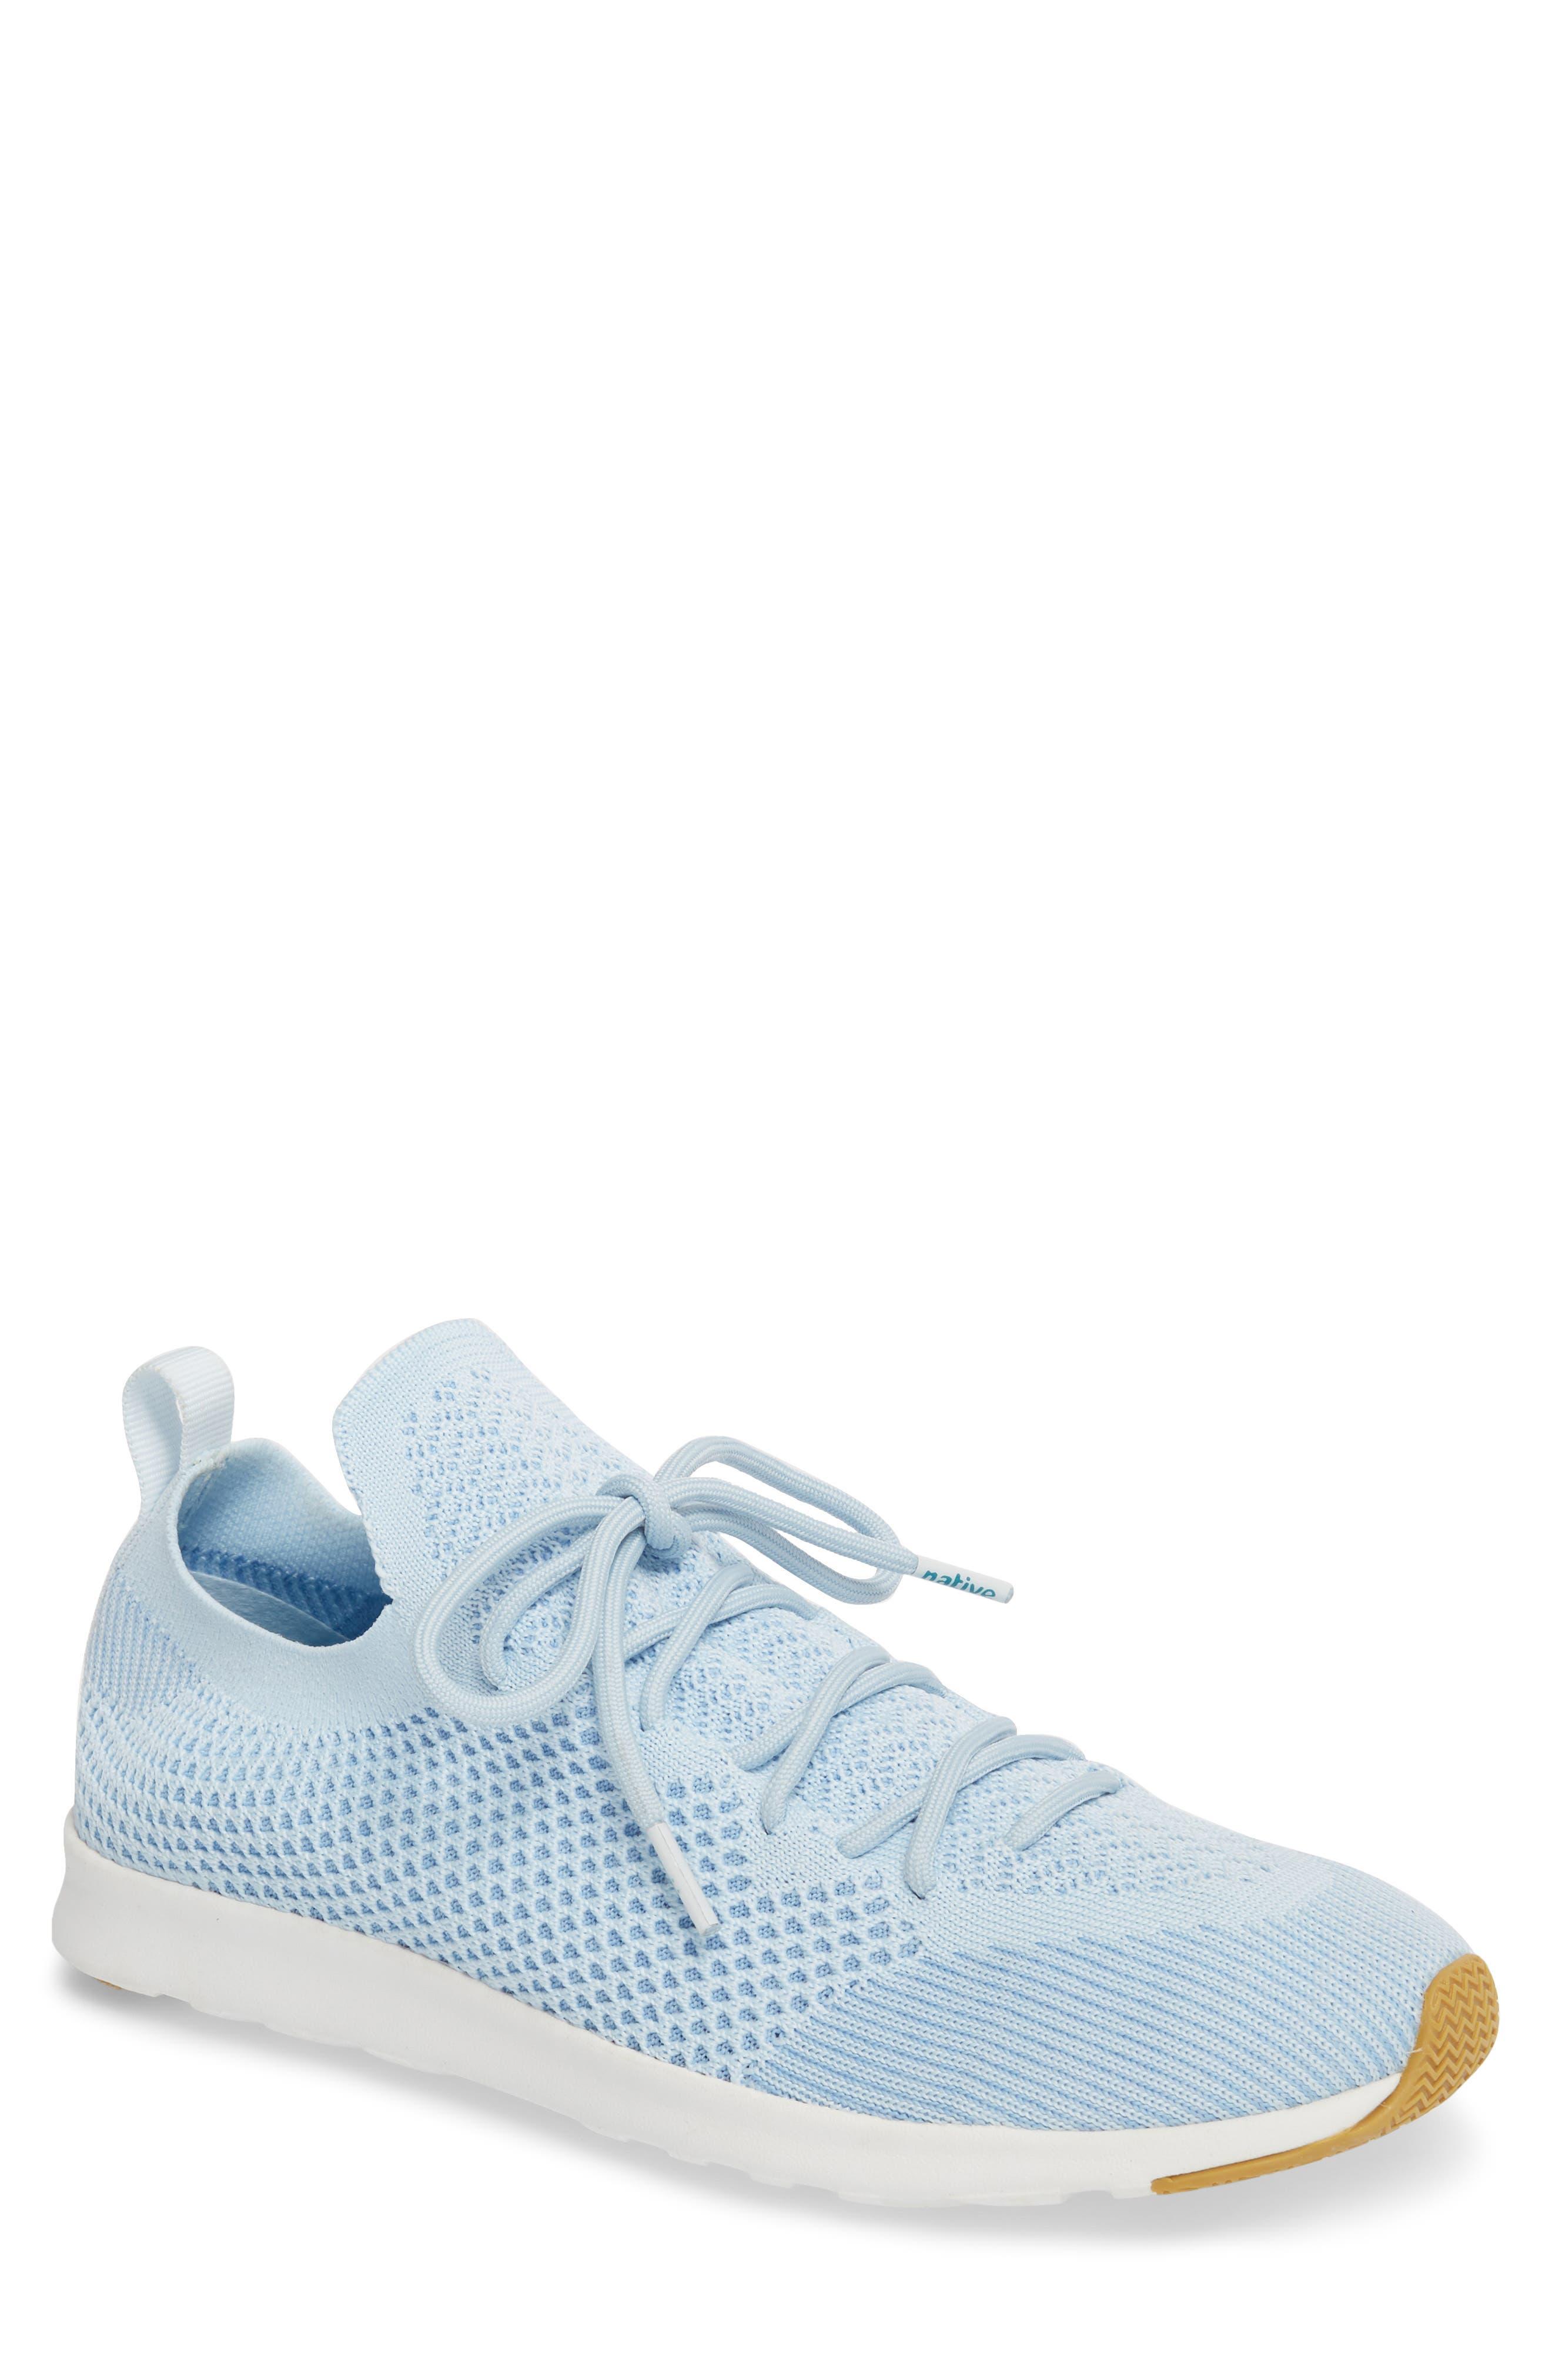 AP Mercury Liteknit<sup>™</sup> Sneaker,                             Main thumbnail 1, color,                             AIR BLUE/ SHELL WHITE